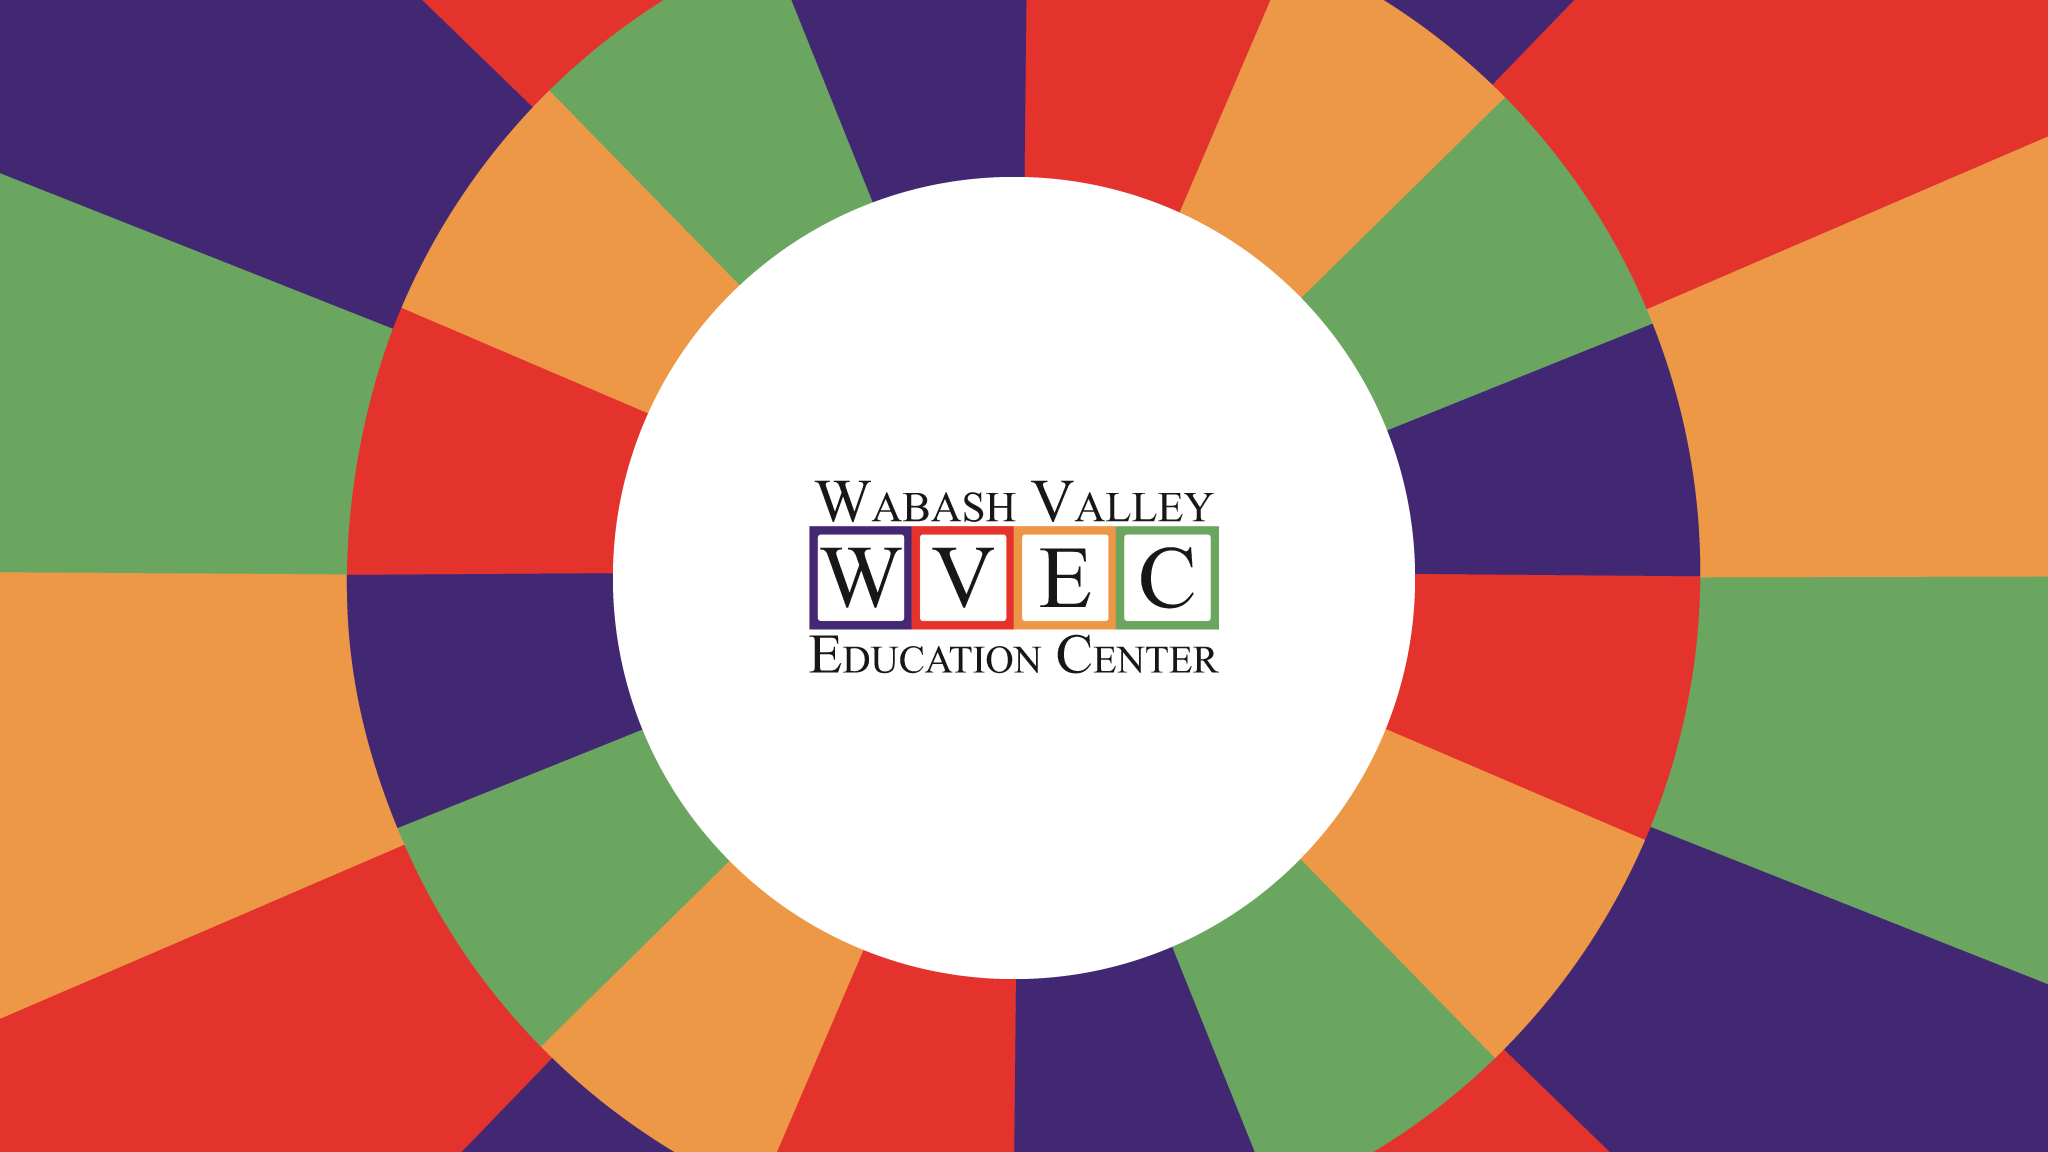 WVEC_Community Banner-1